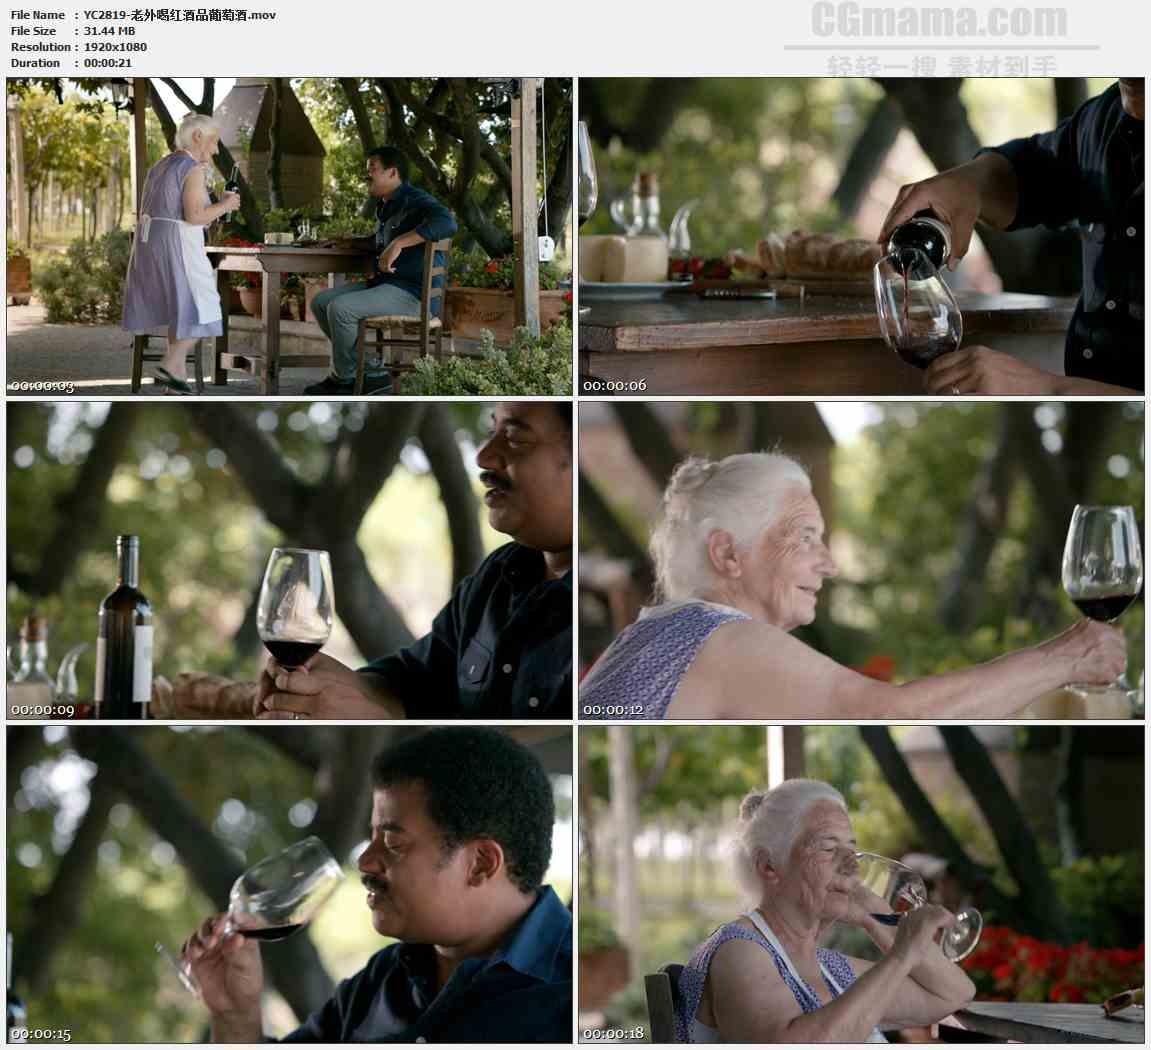 YC2819-老外喝红酒品葡萄酒高清实拍视频素材